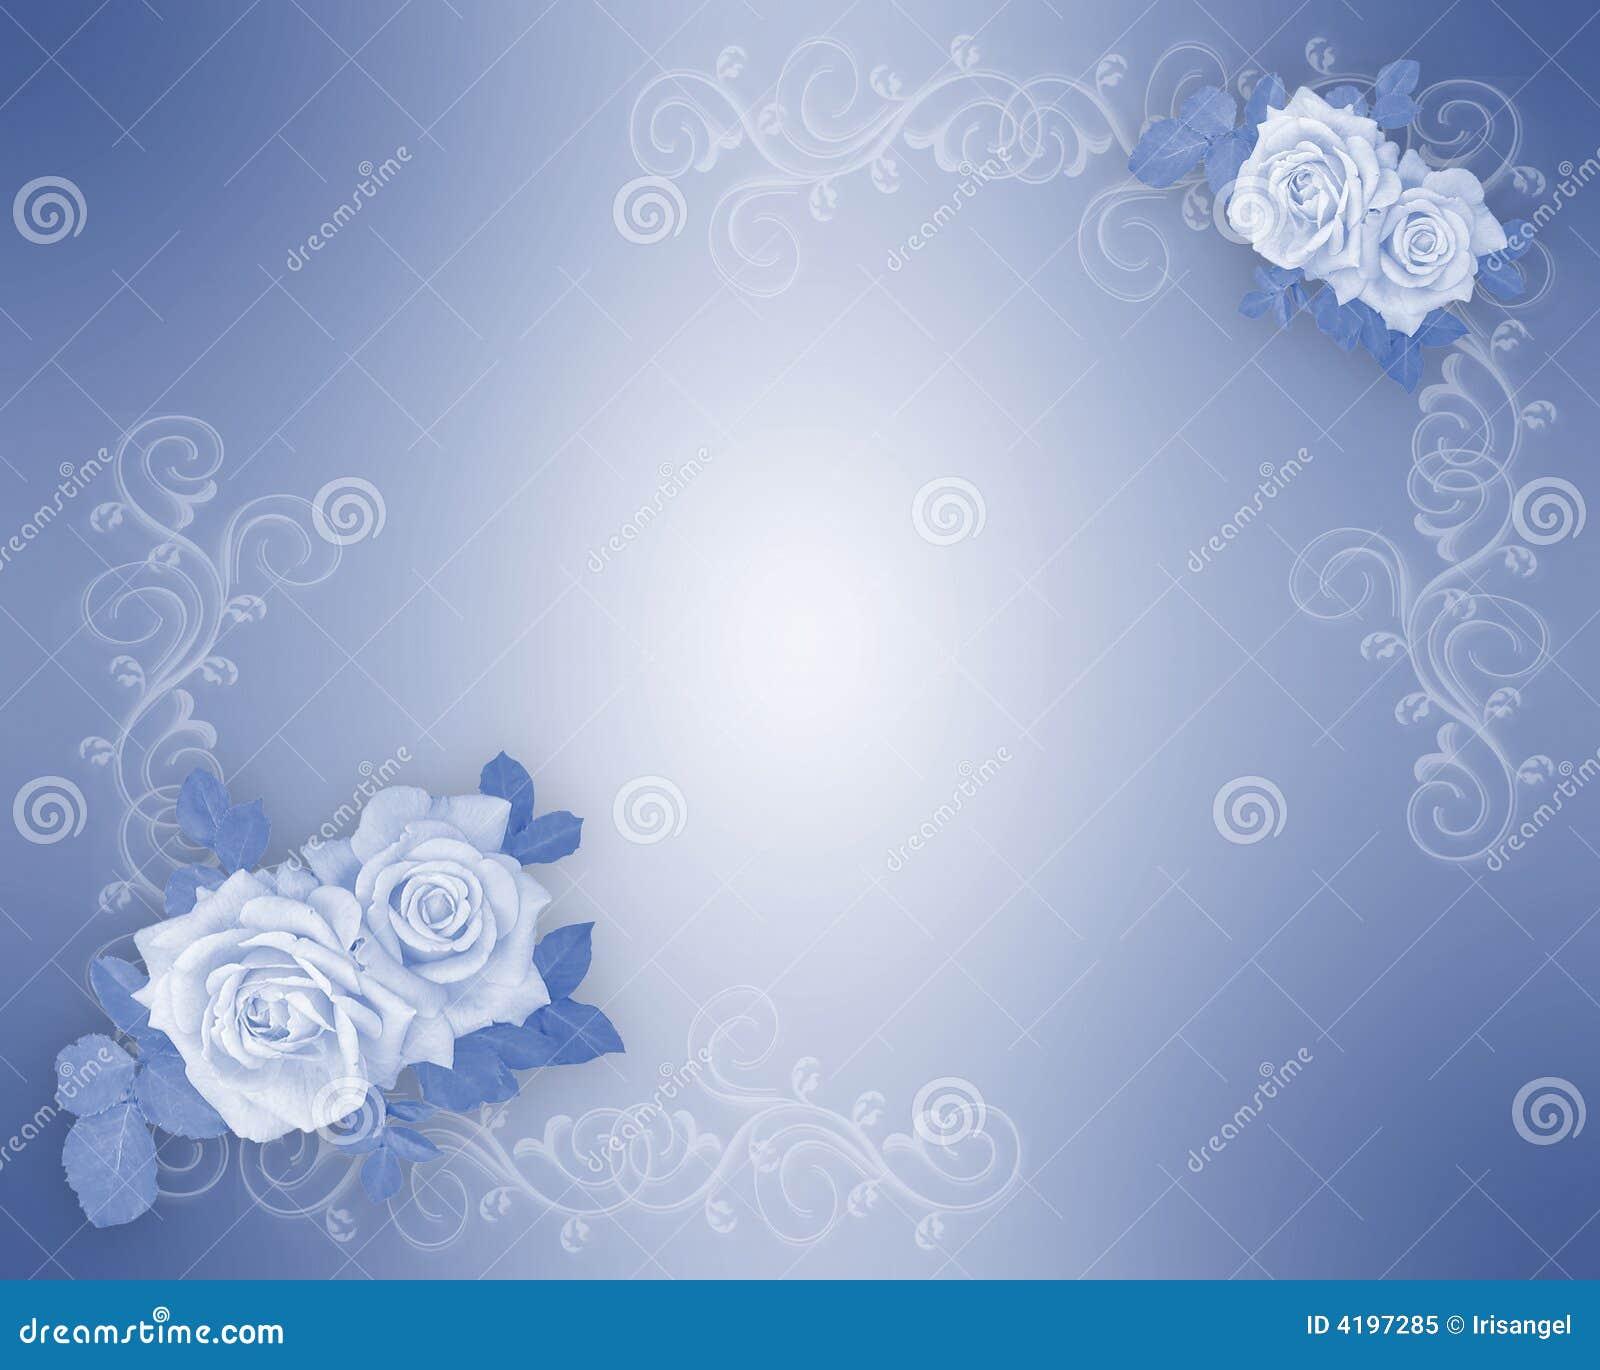 Lavender And Silver Wedding Invitations for beautiful invitation template